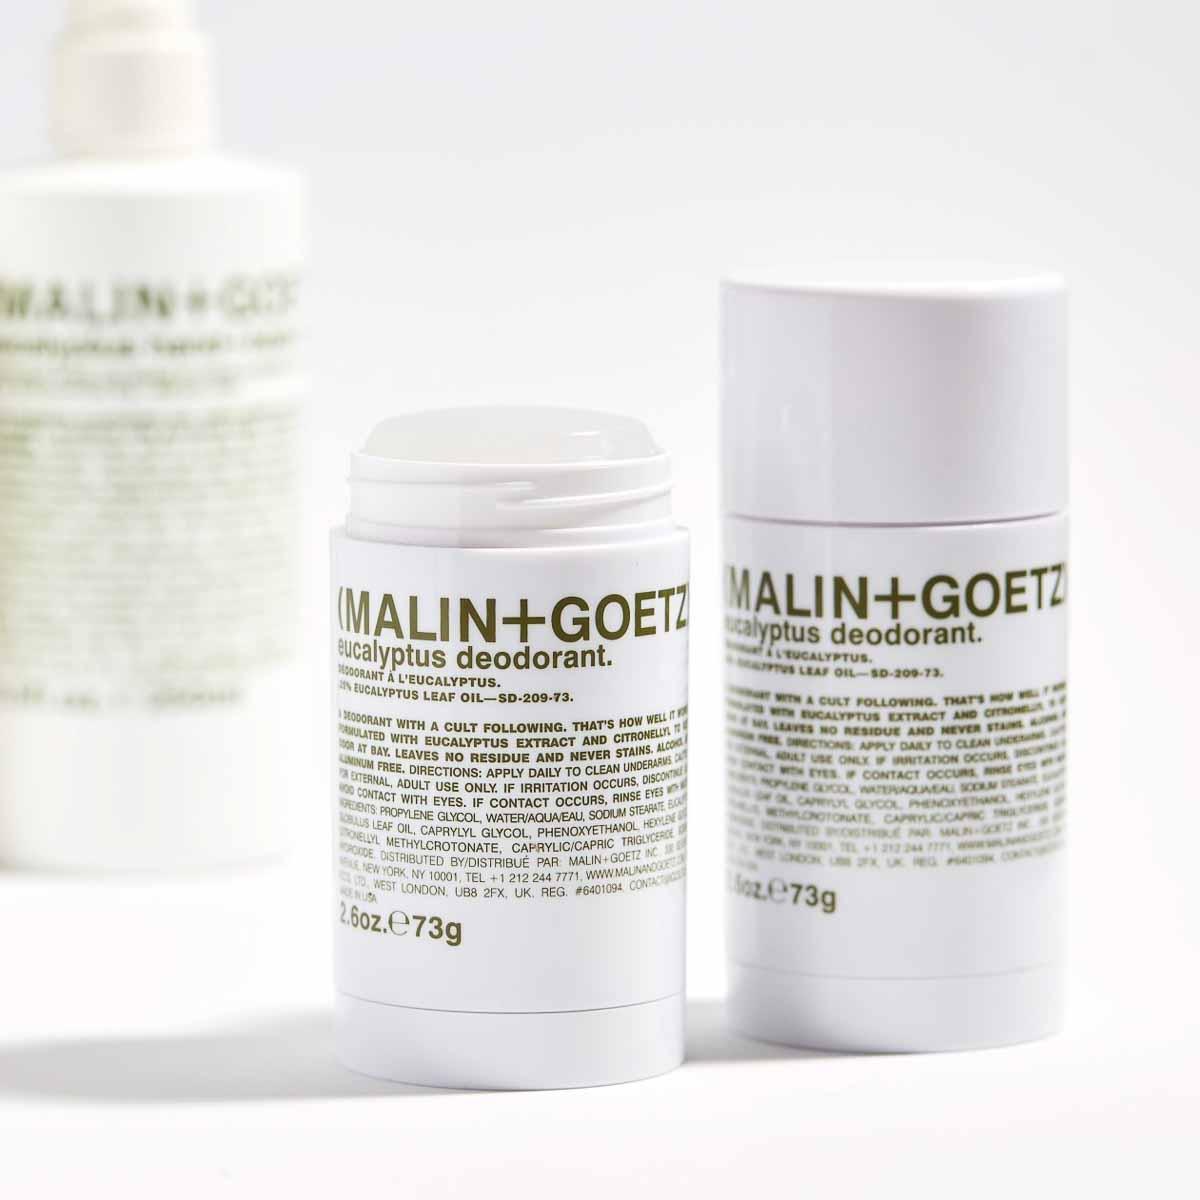 Malin+Goetz Deodorant